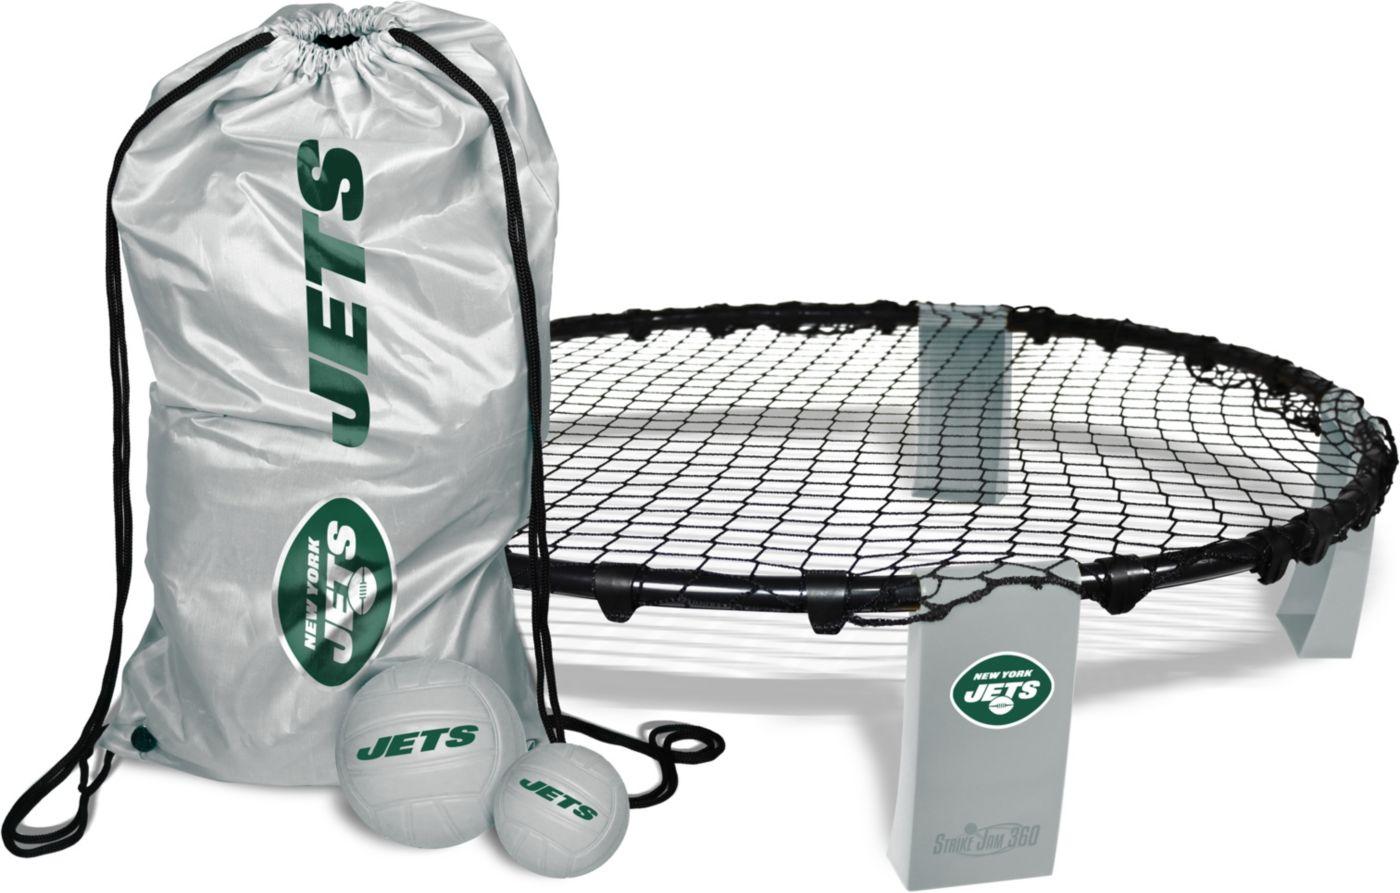 Wild Sports New York Jets Strike Jam Combo Game